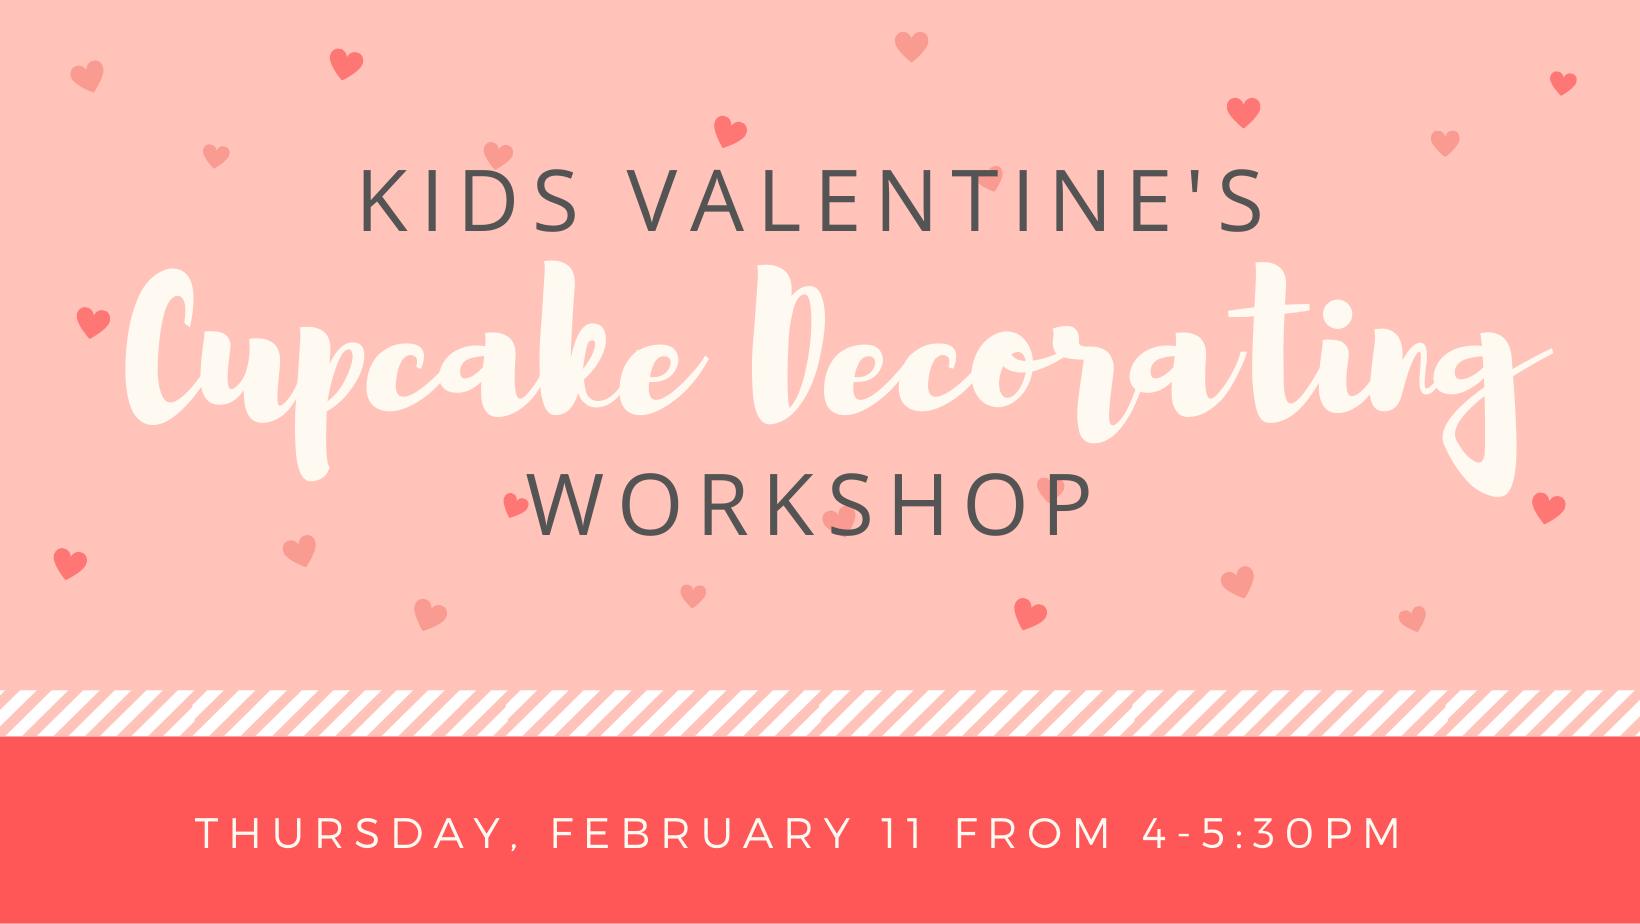 valentines cupcake decorating workshop 7E3CEJ.tmp